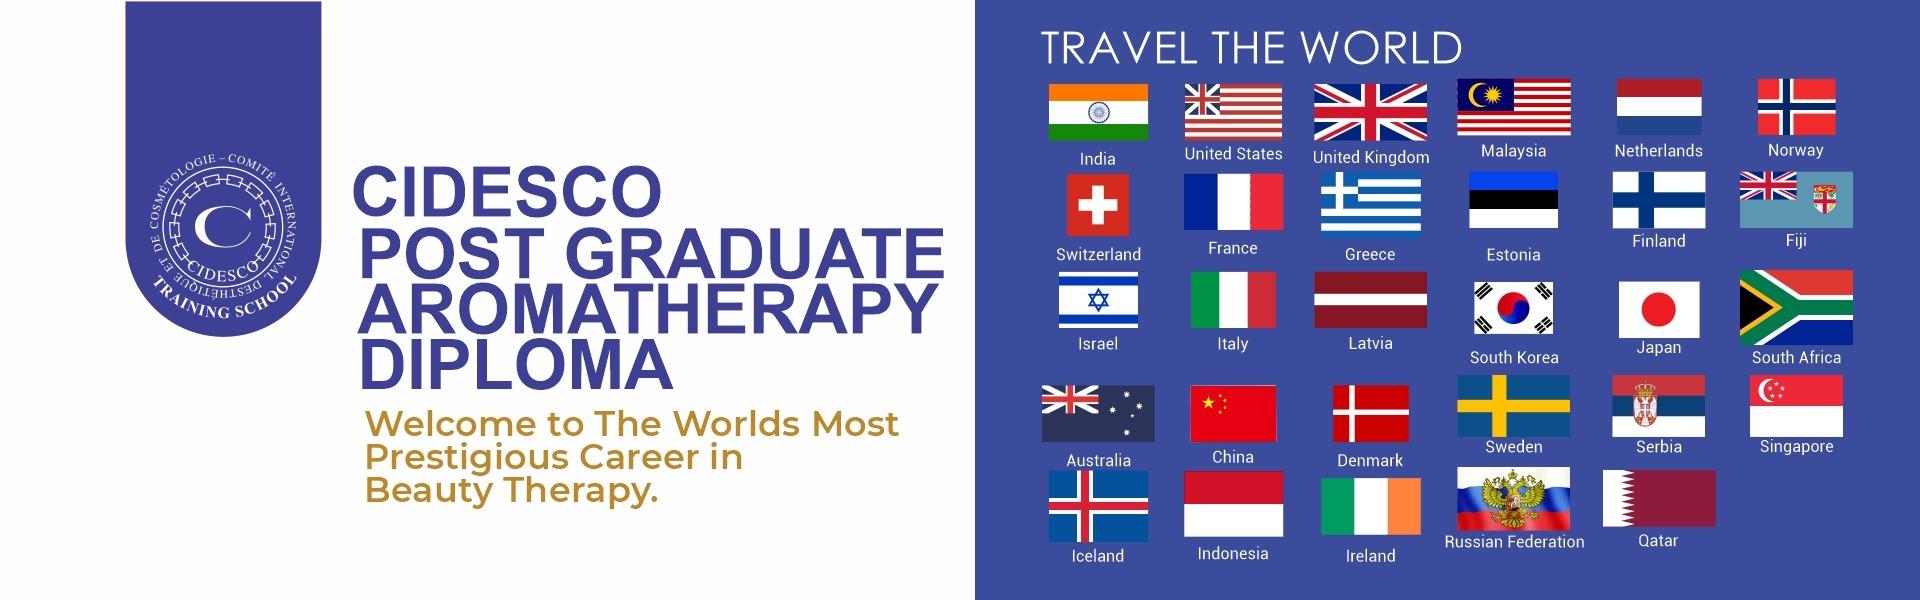 CIDESCO Post Graduate Aromatherapy Diploma